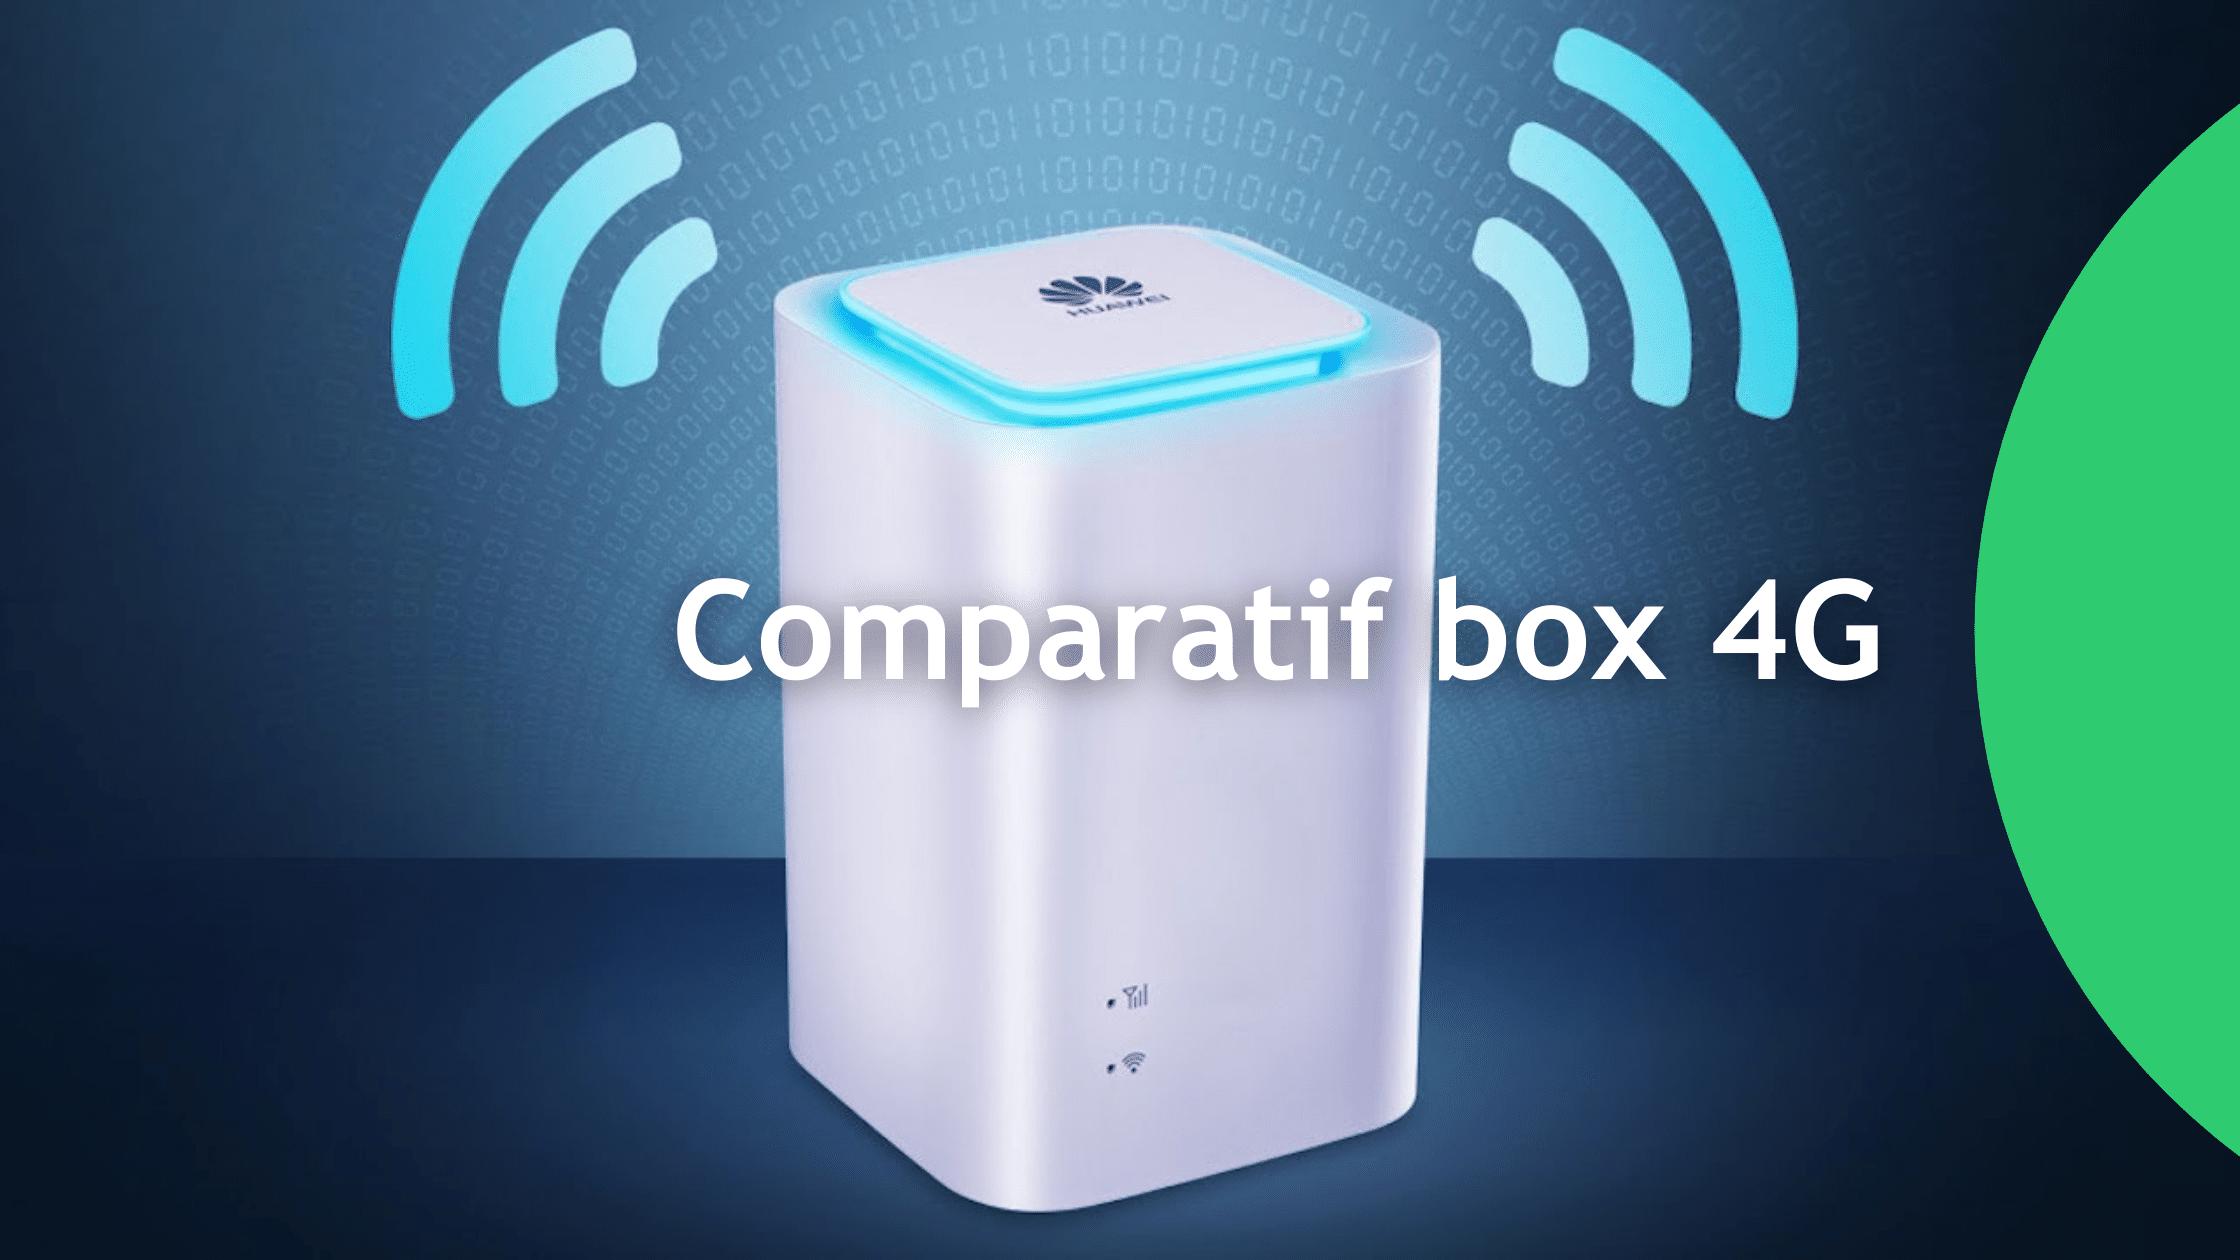 Comparatif box 4G